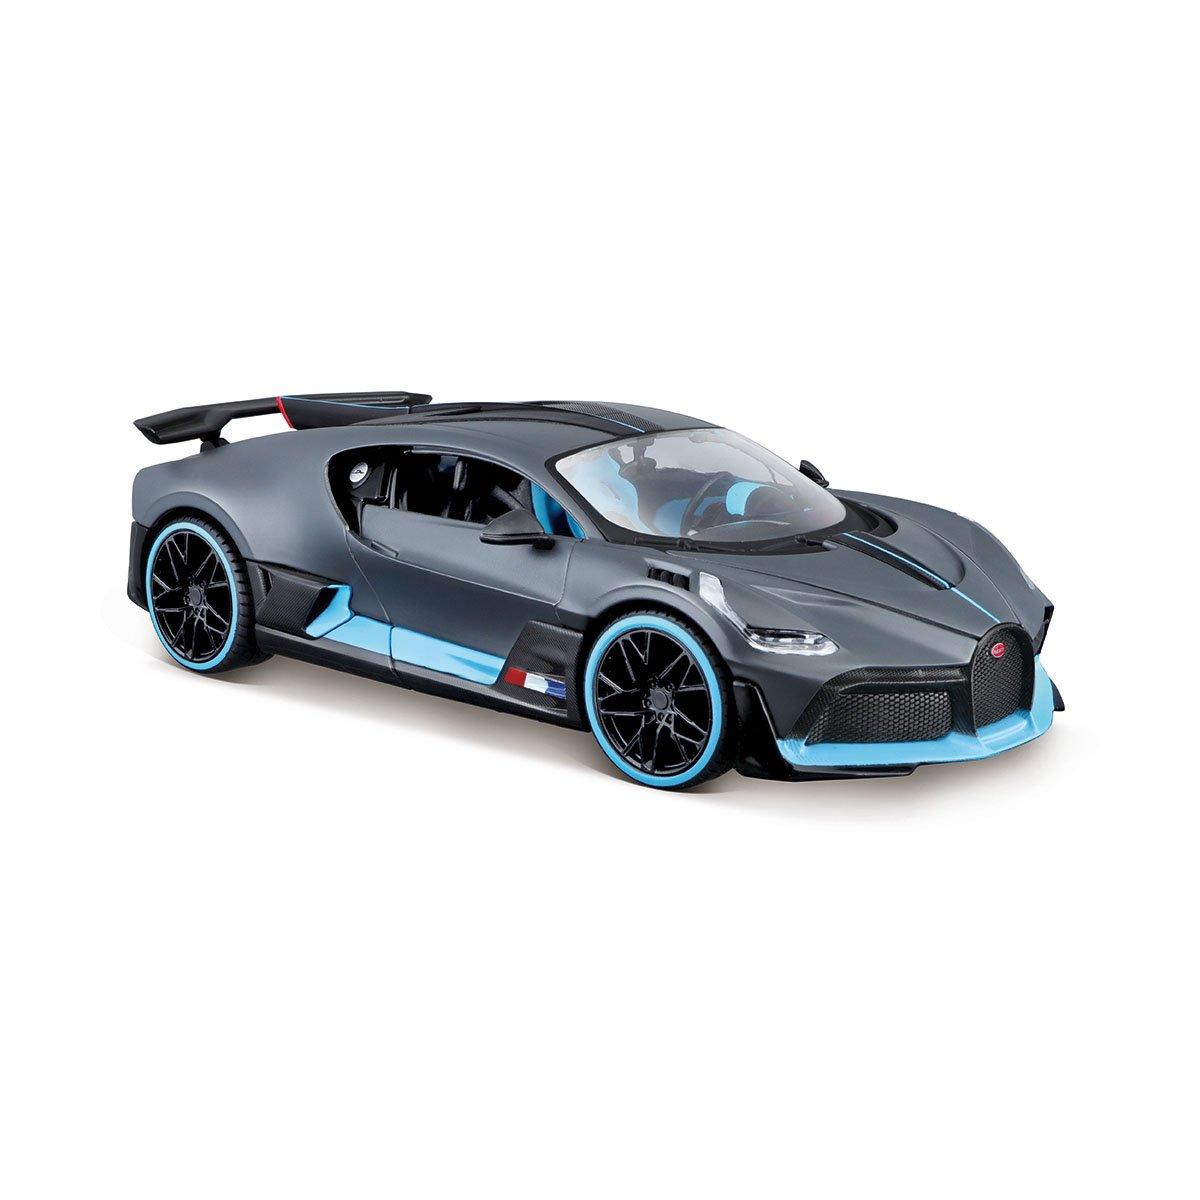 Masinuta Maisto Bugatti Divo, 1:24, Gri